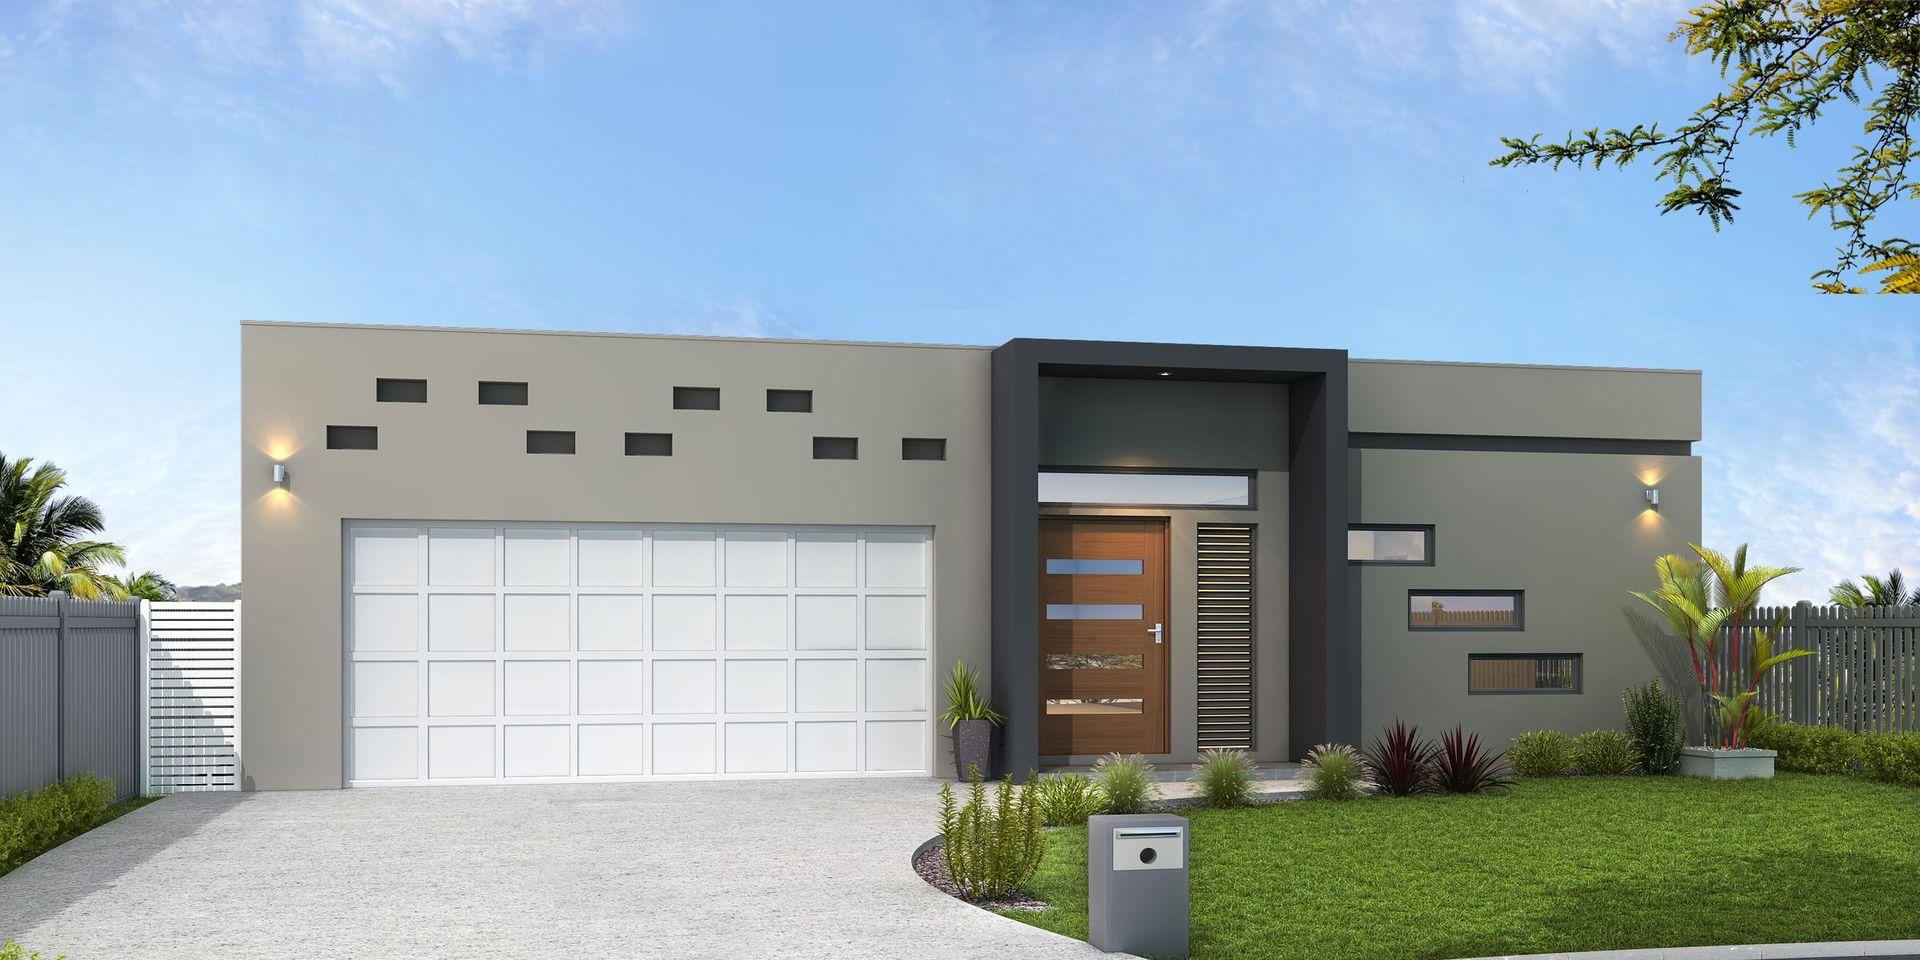 LOT 15 Aroona Street, Caravonica QLD 4878, Image 0